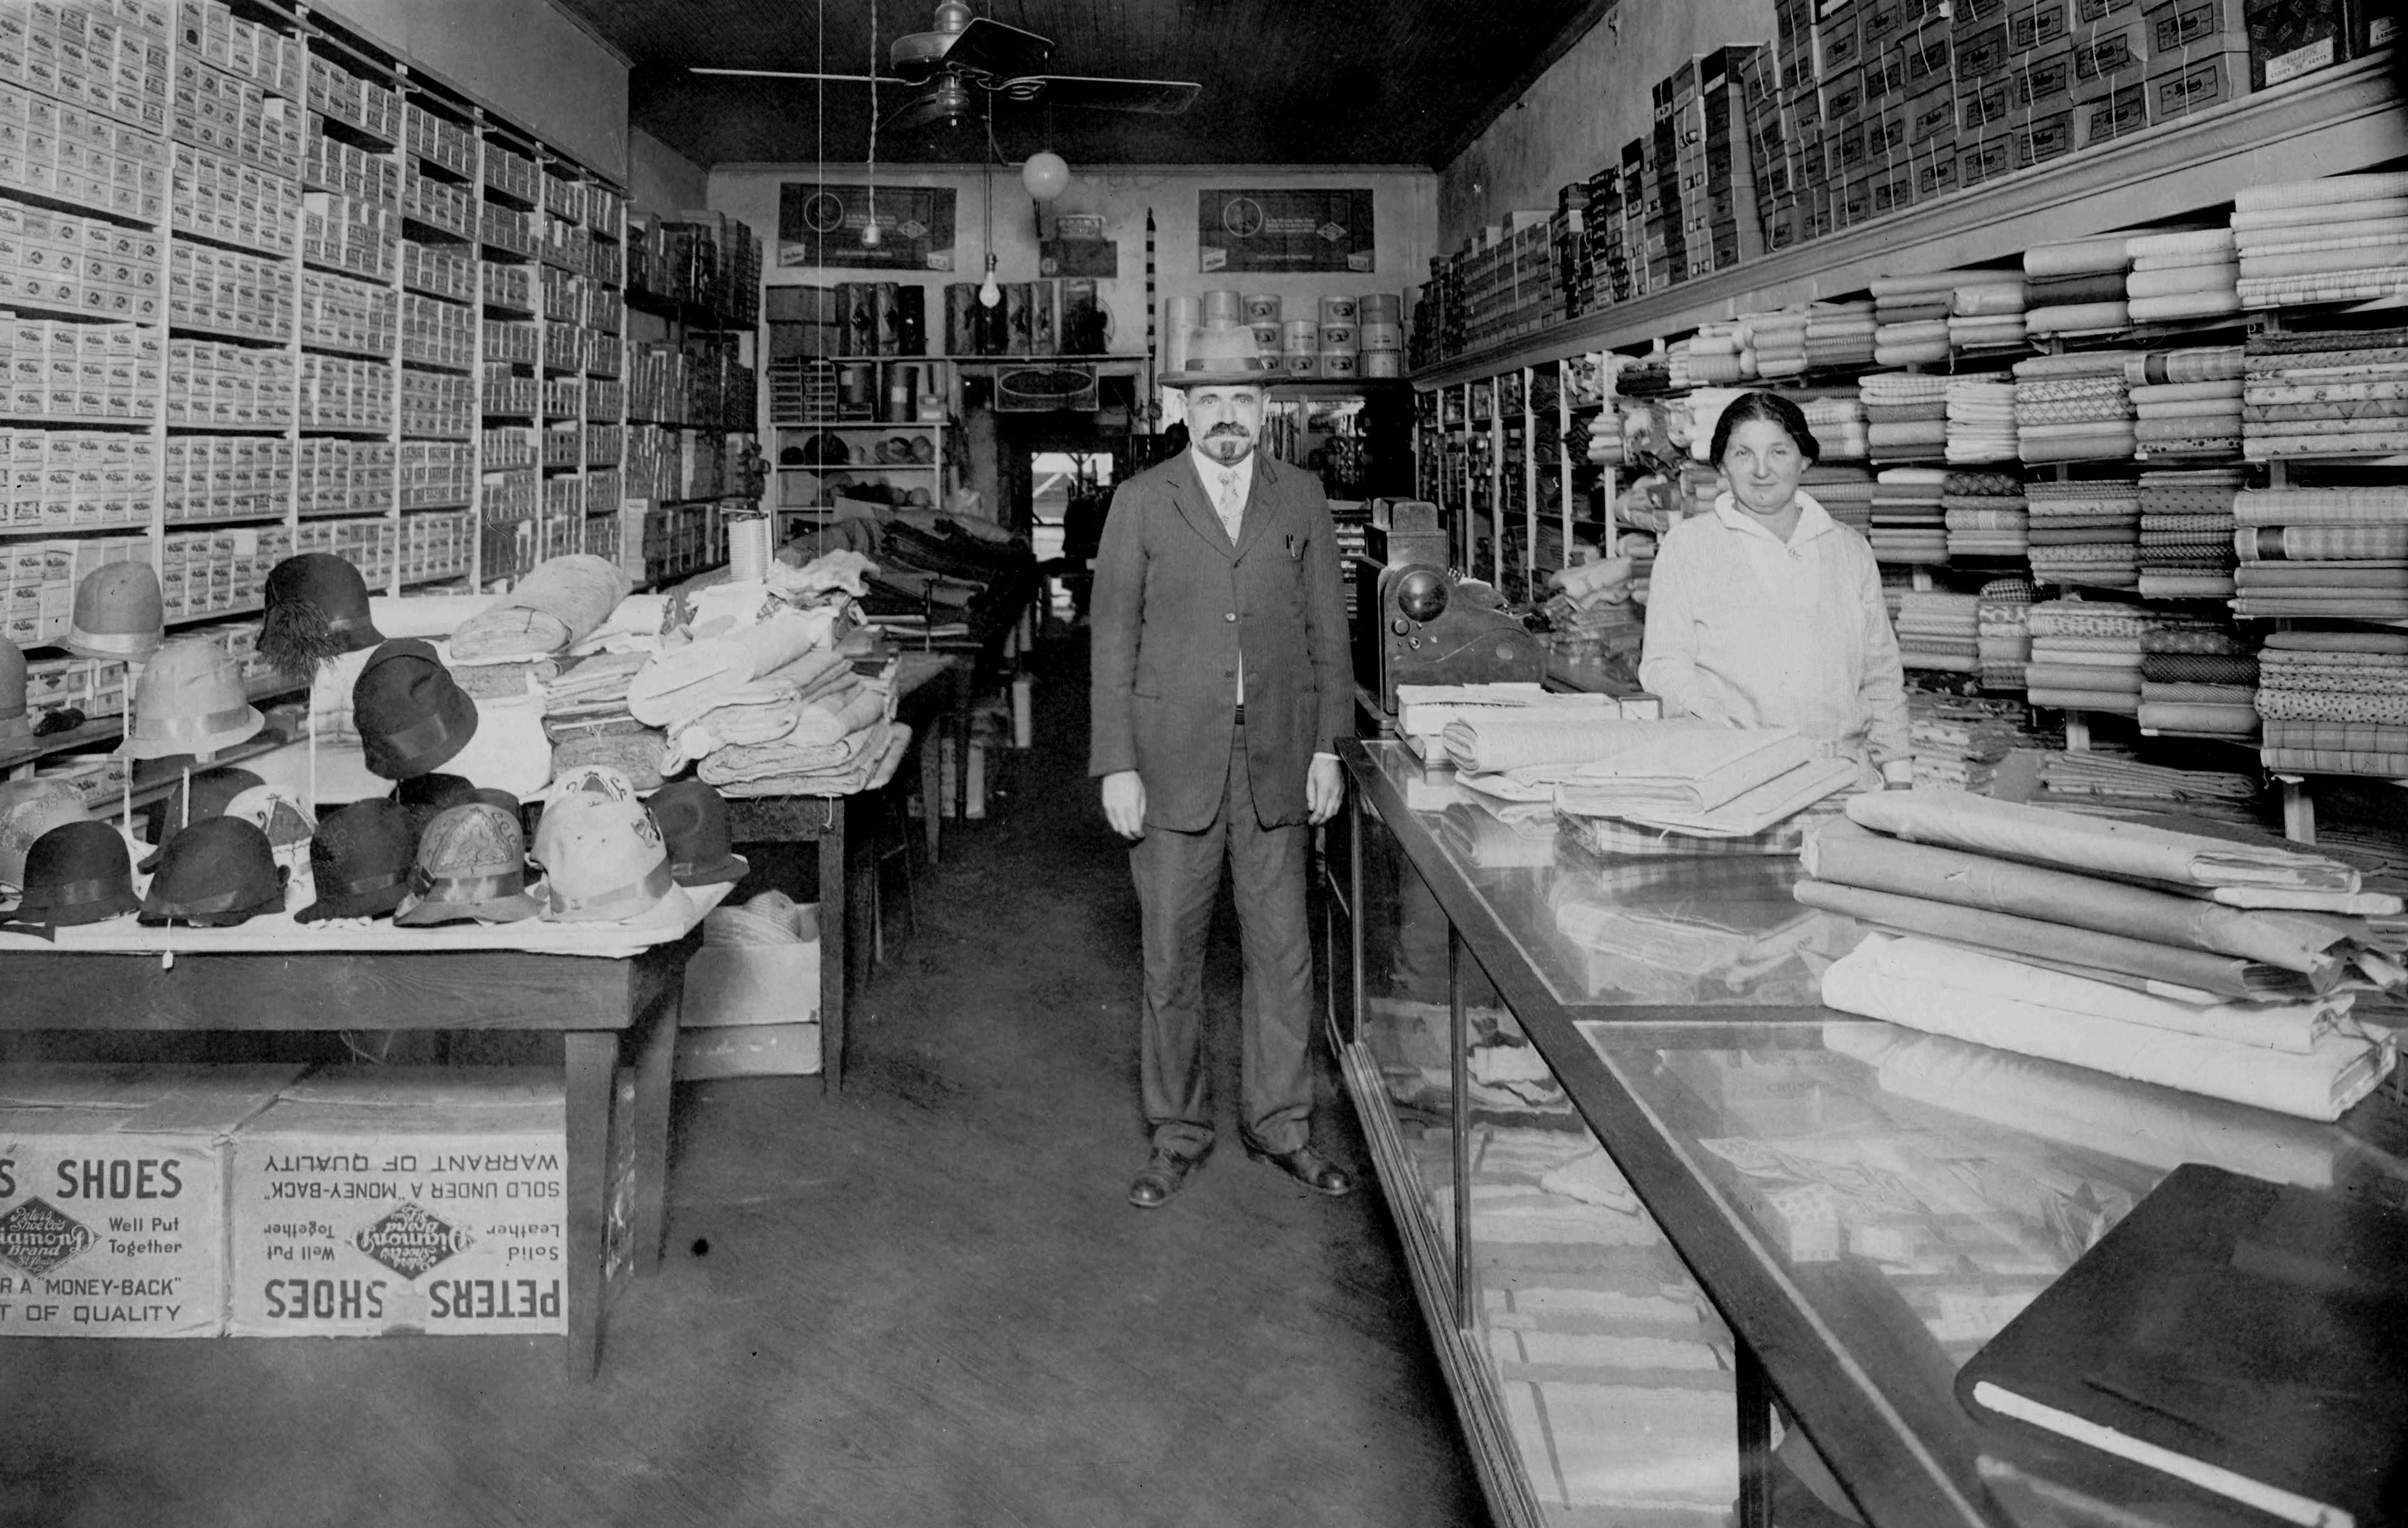 Yelman_s_ St. Matthews_circa 1930